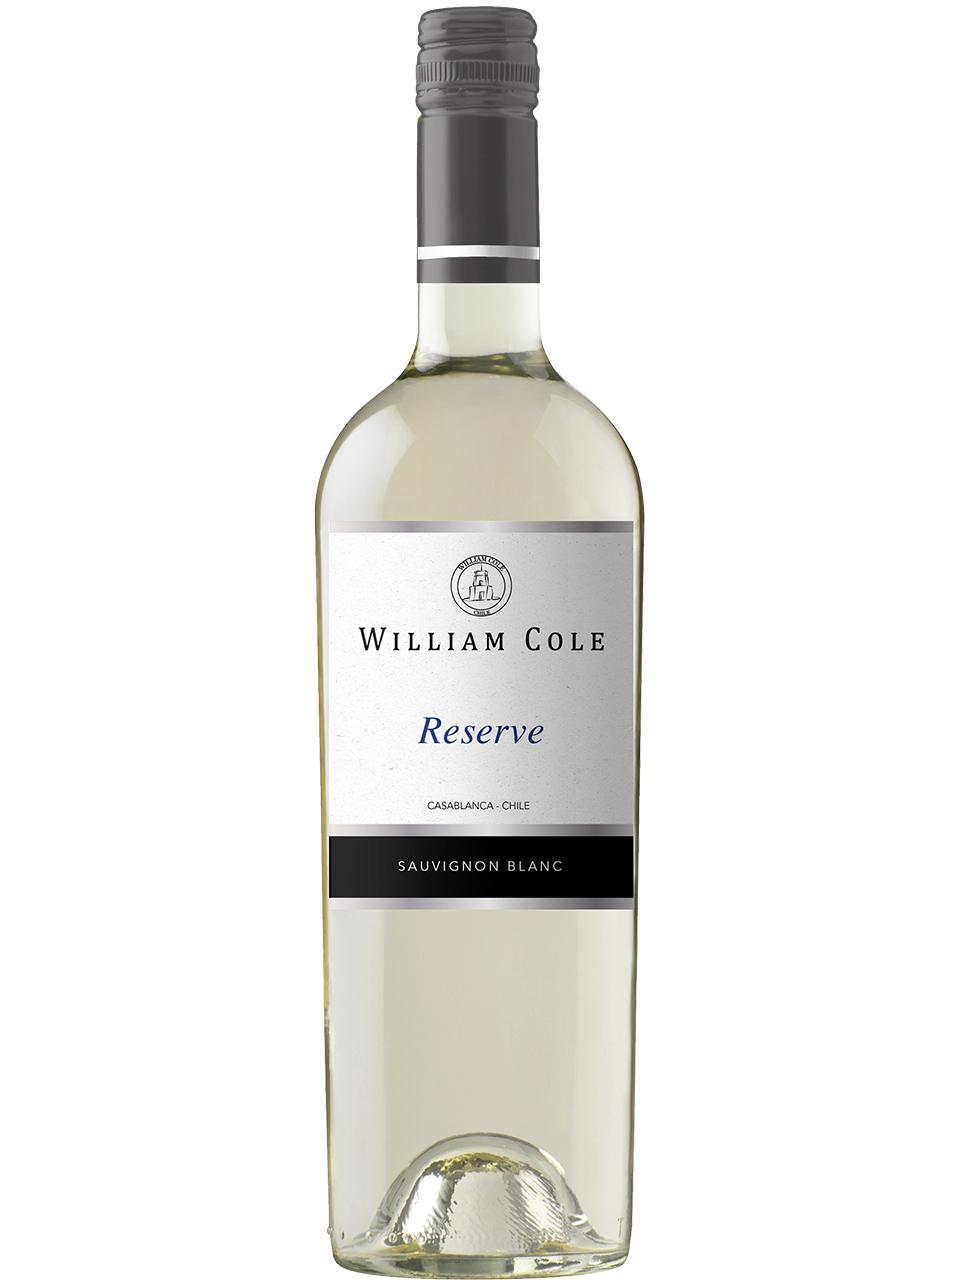 William Cole Reserve Sauvignon Blanc